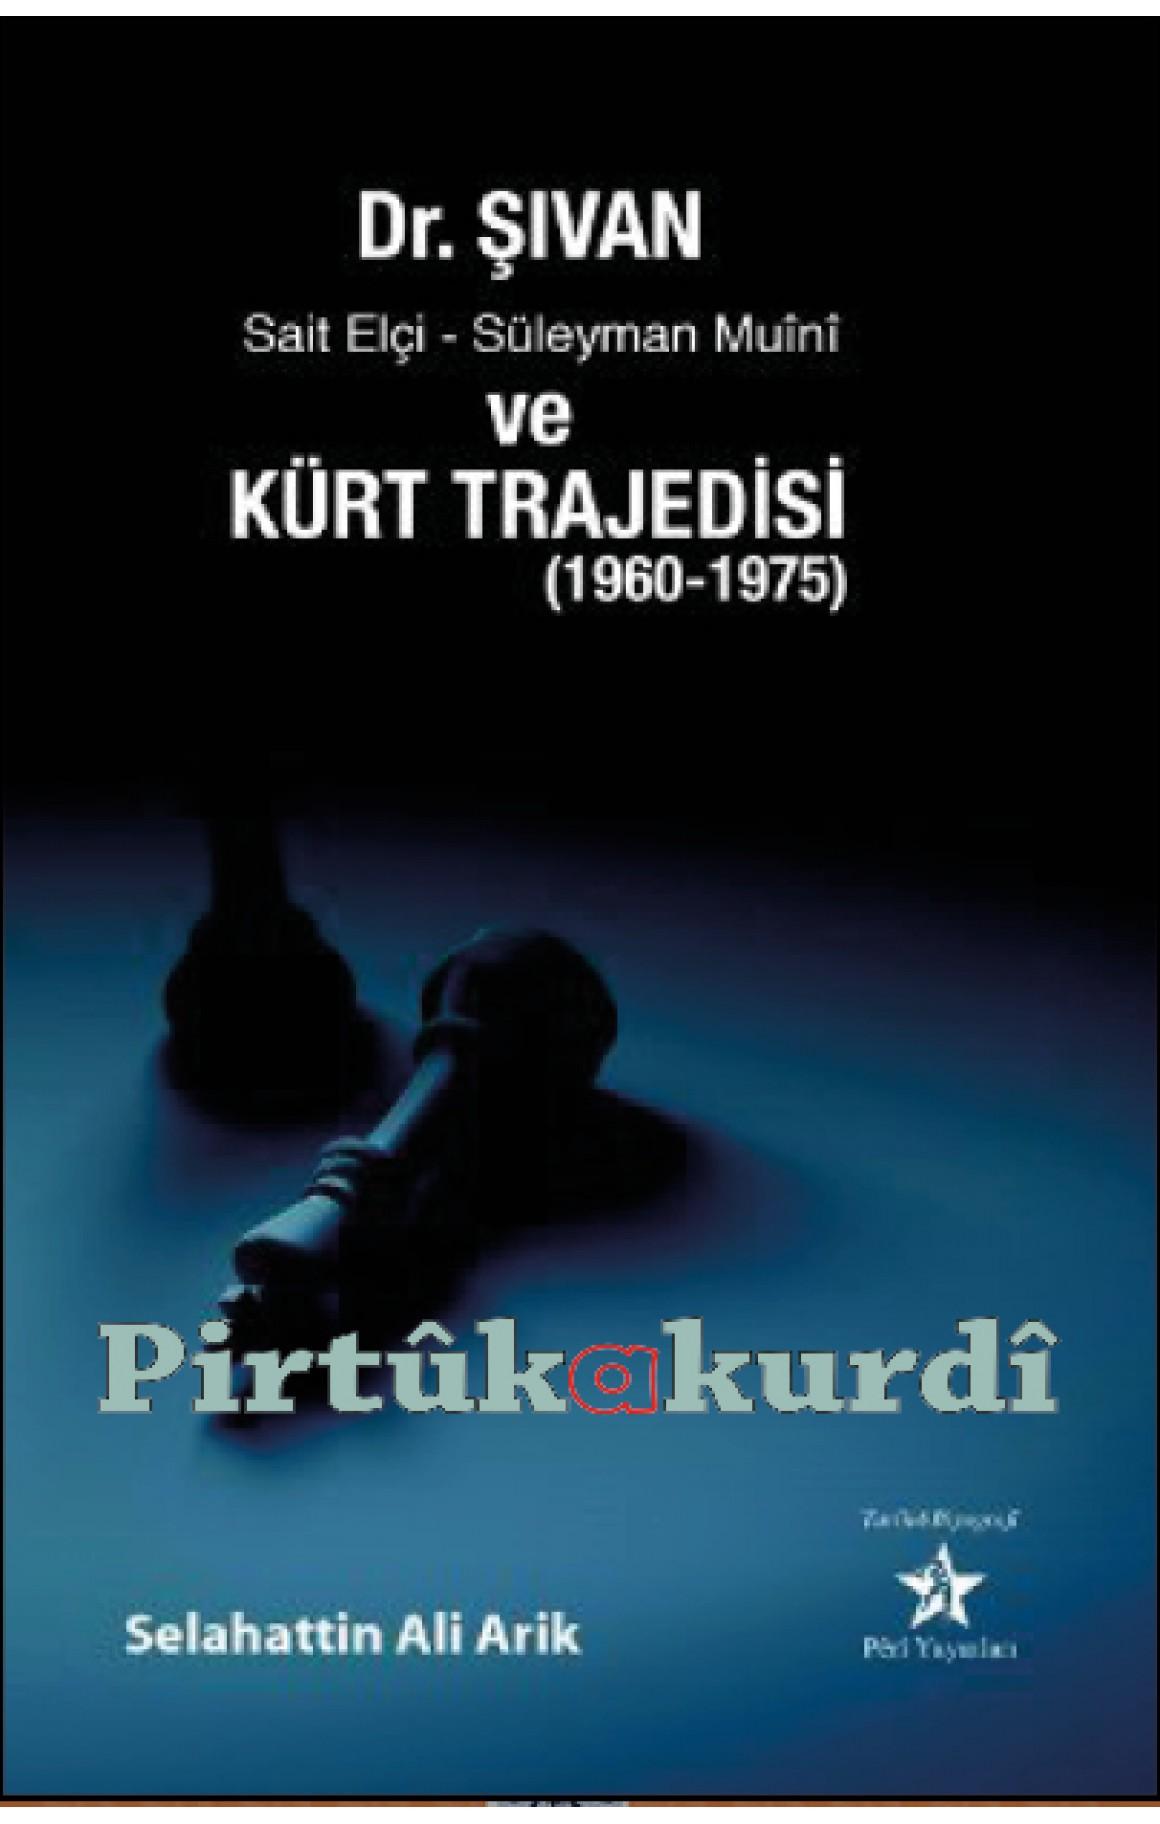 Dr. Şıvan, Sait Elçi Süleyman Muini ve Kürt Trajedisi